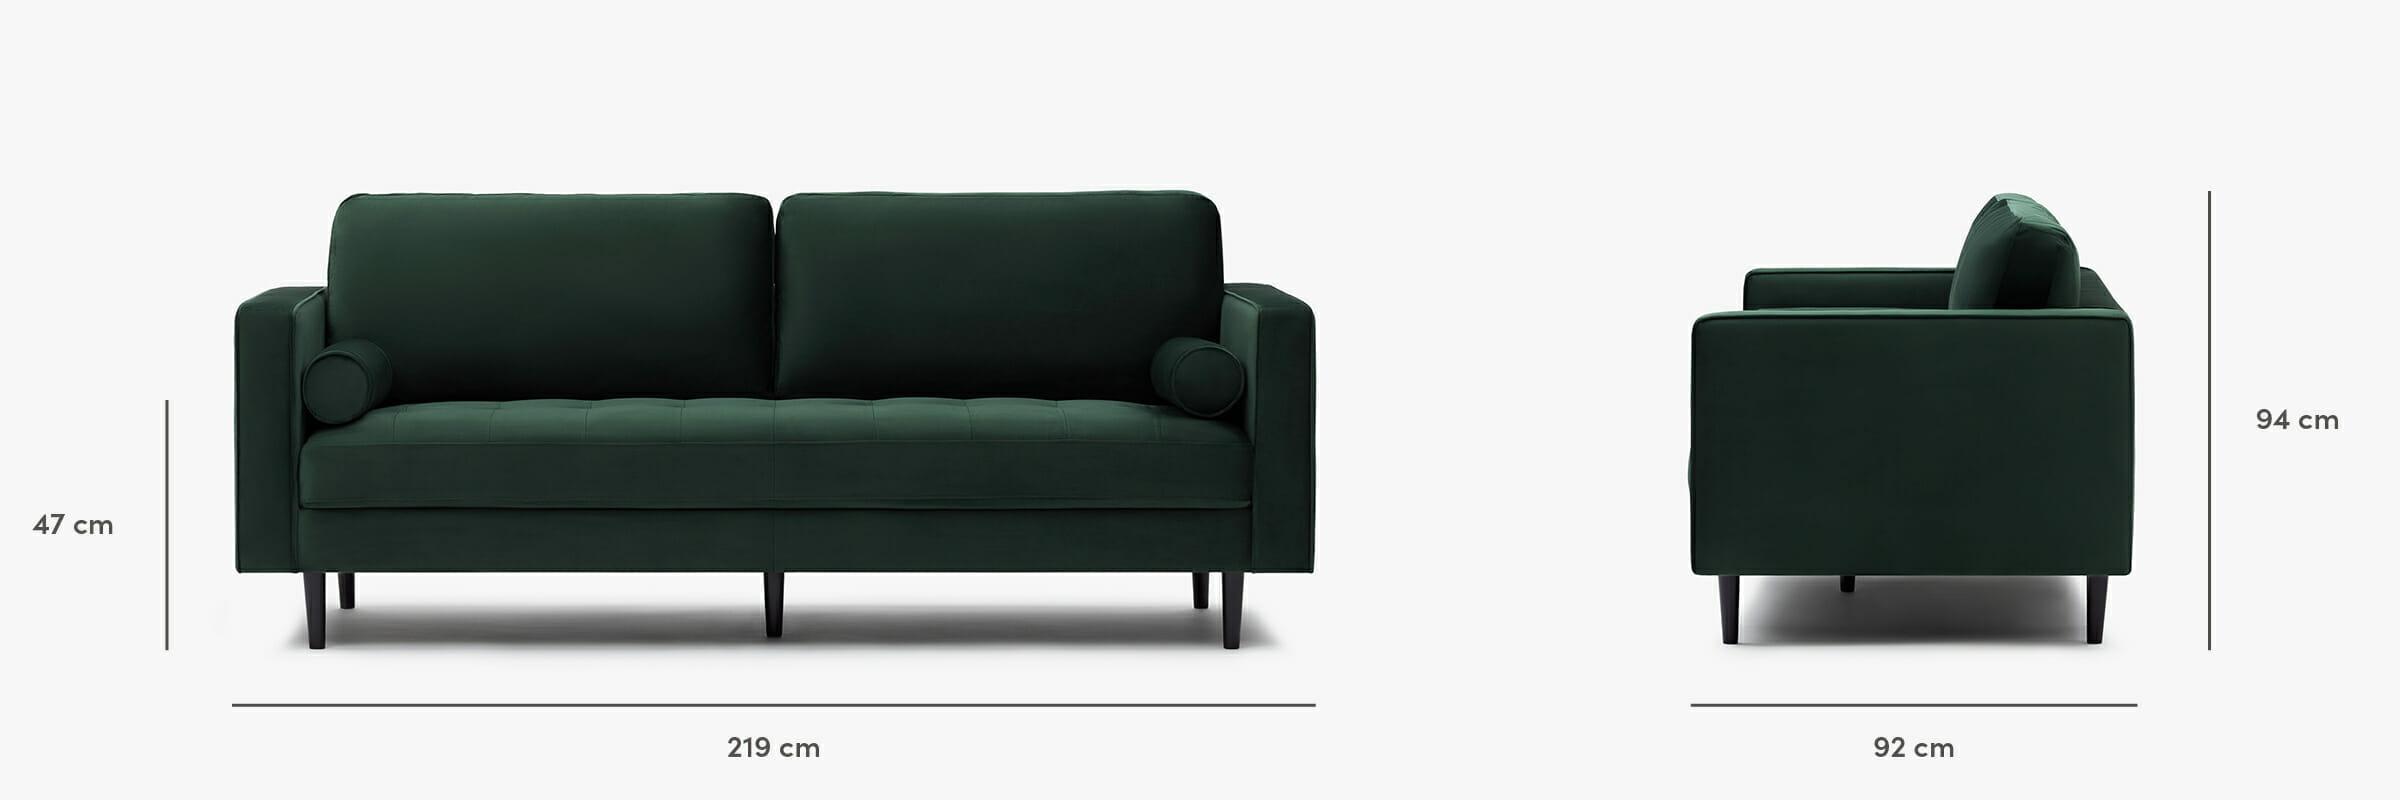 Soho sofa velours - dimensions